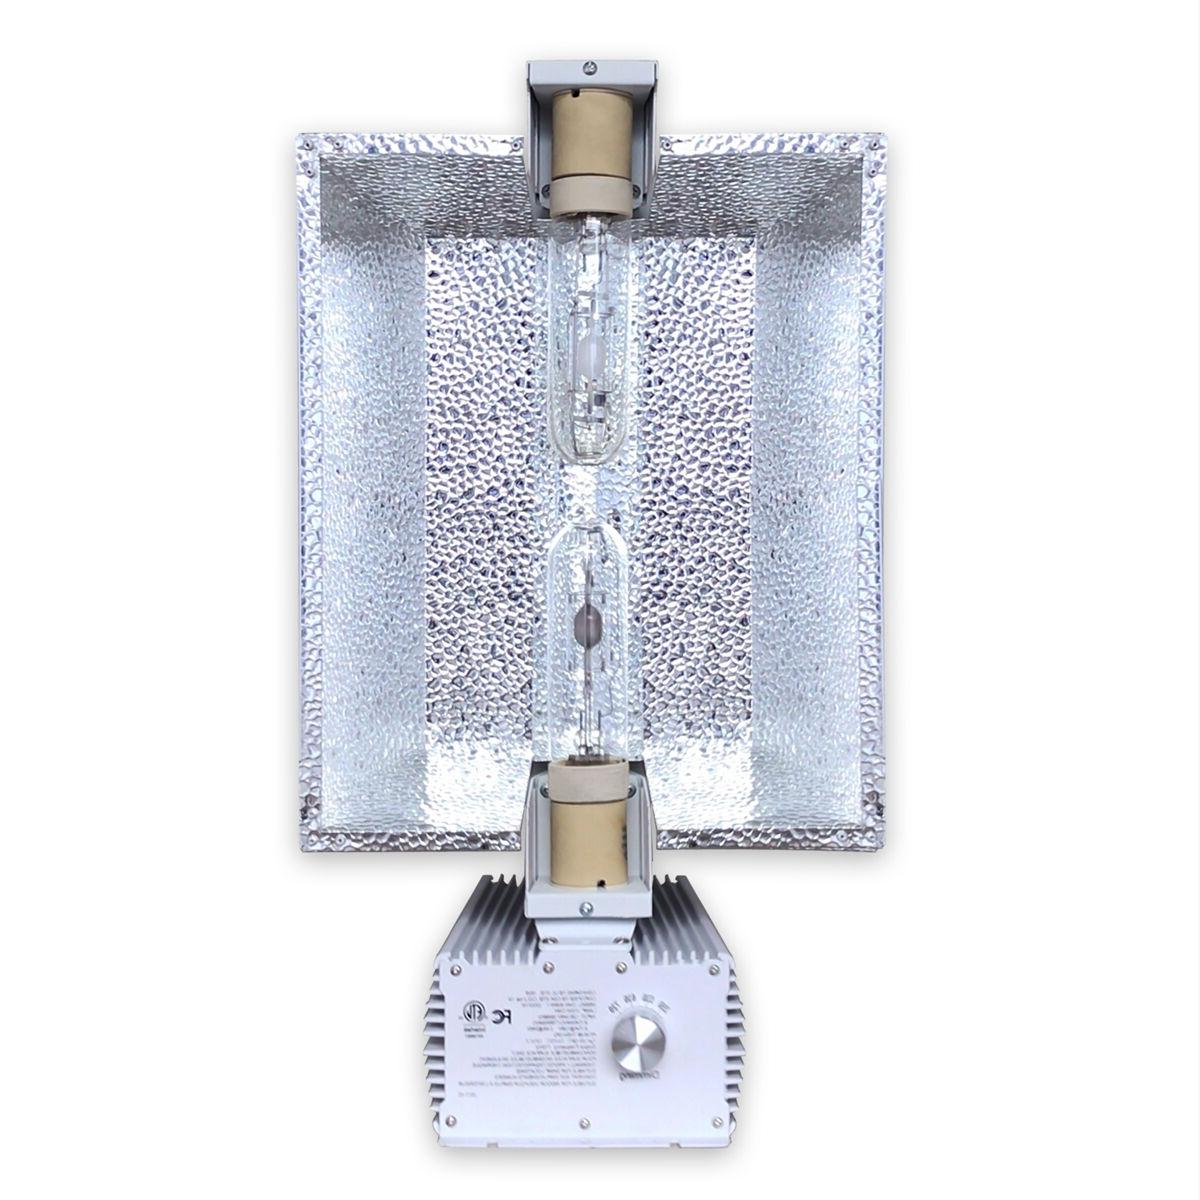 TopoGrow 630W CMH Enclosd 120/240V Kit 120V PLUG